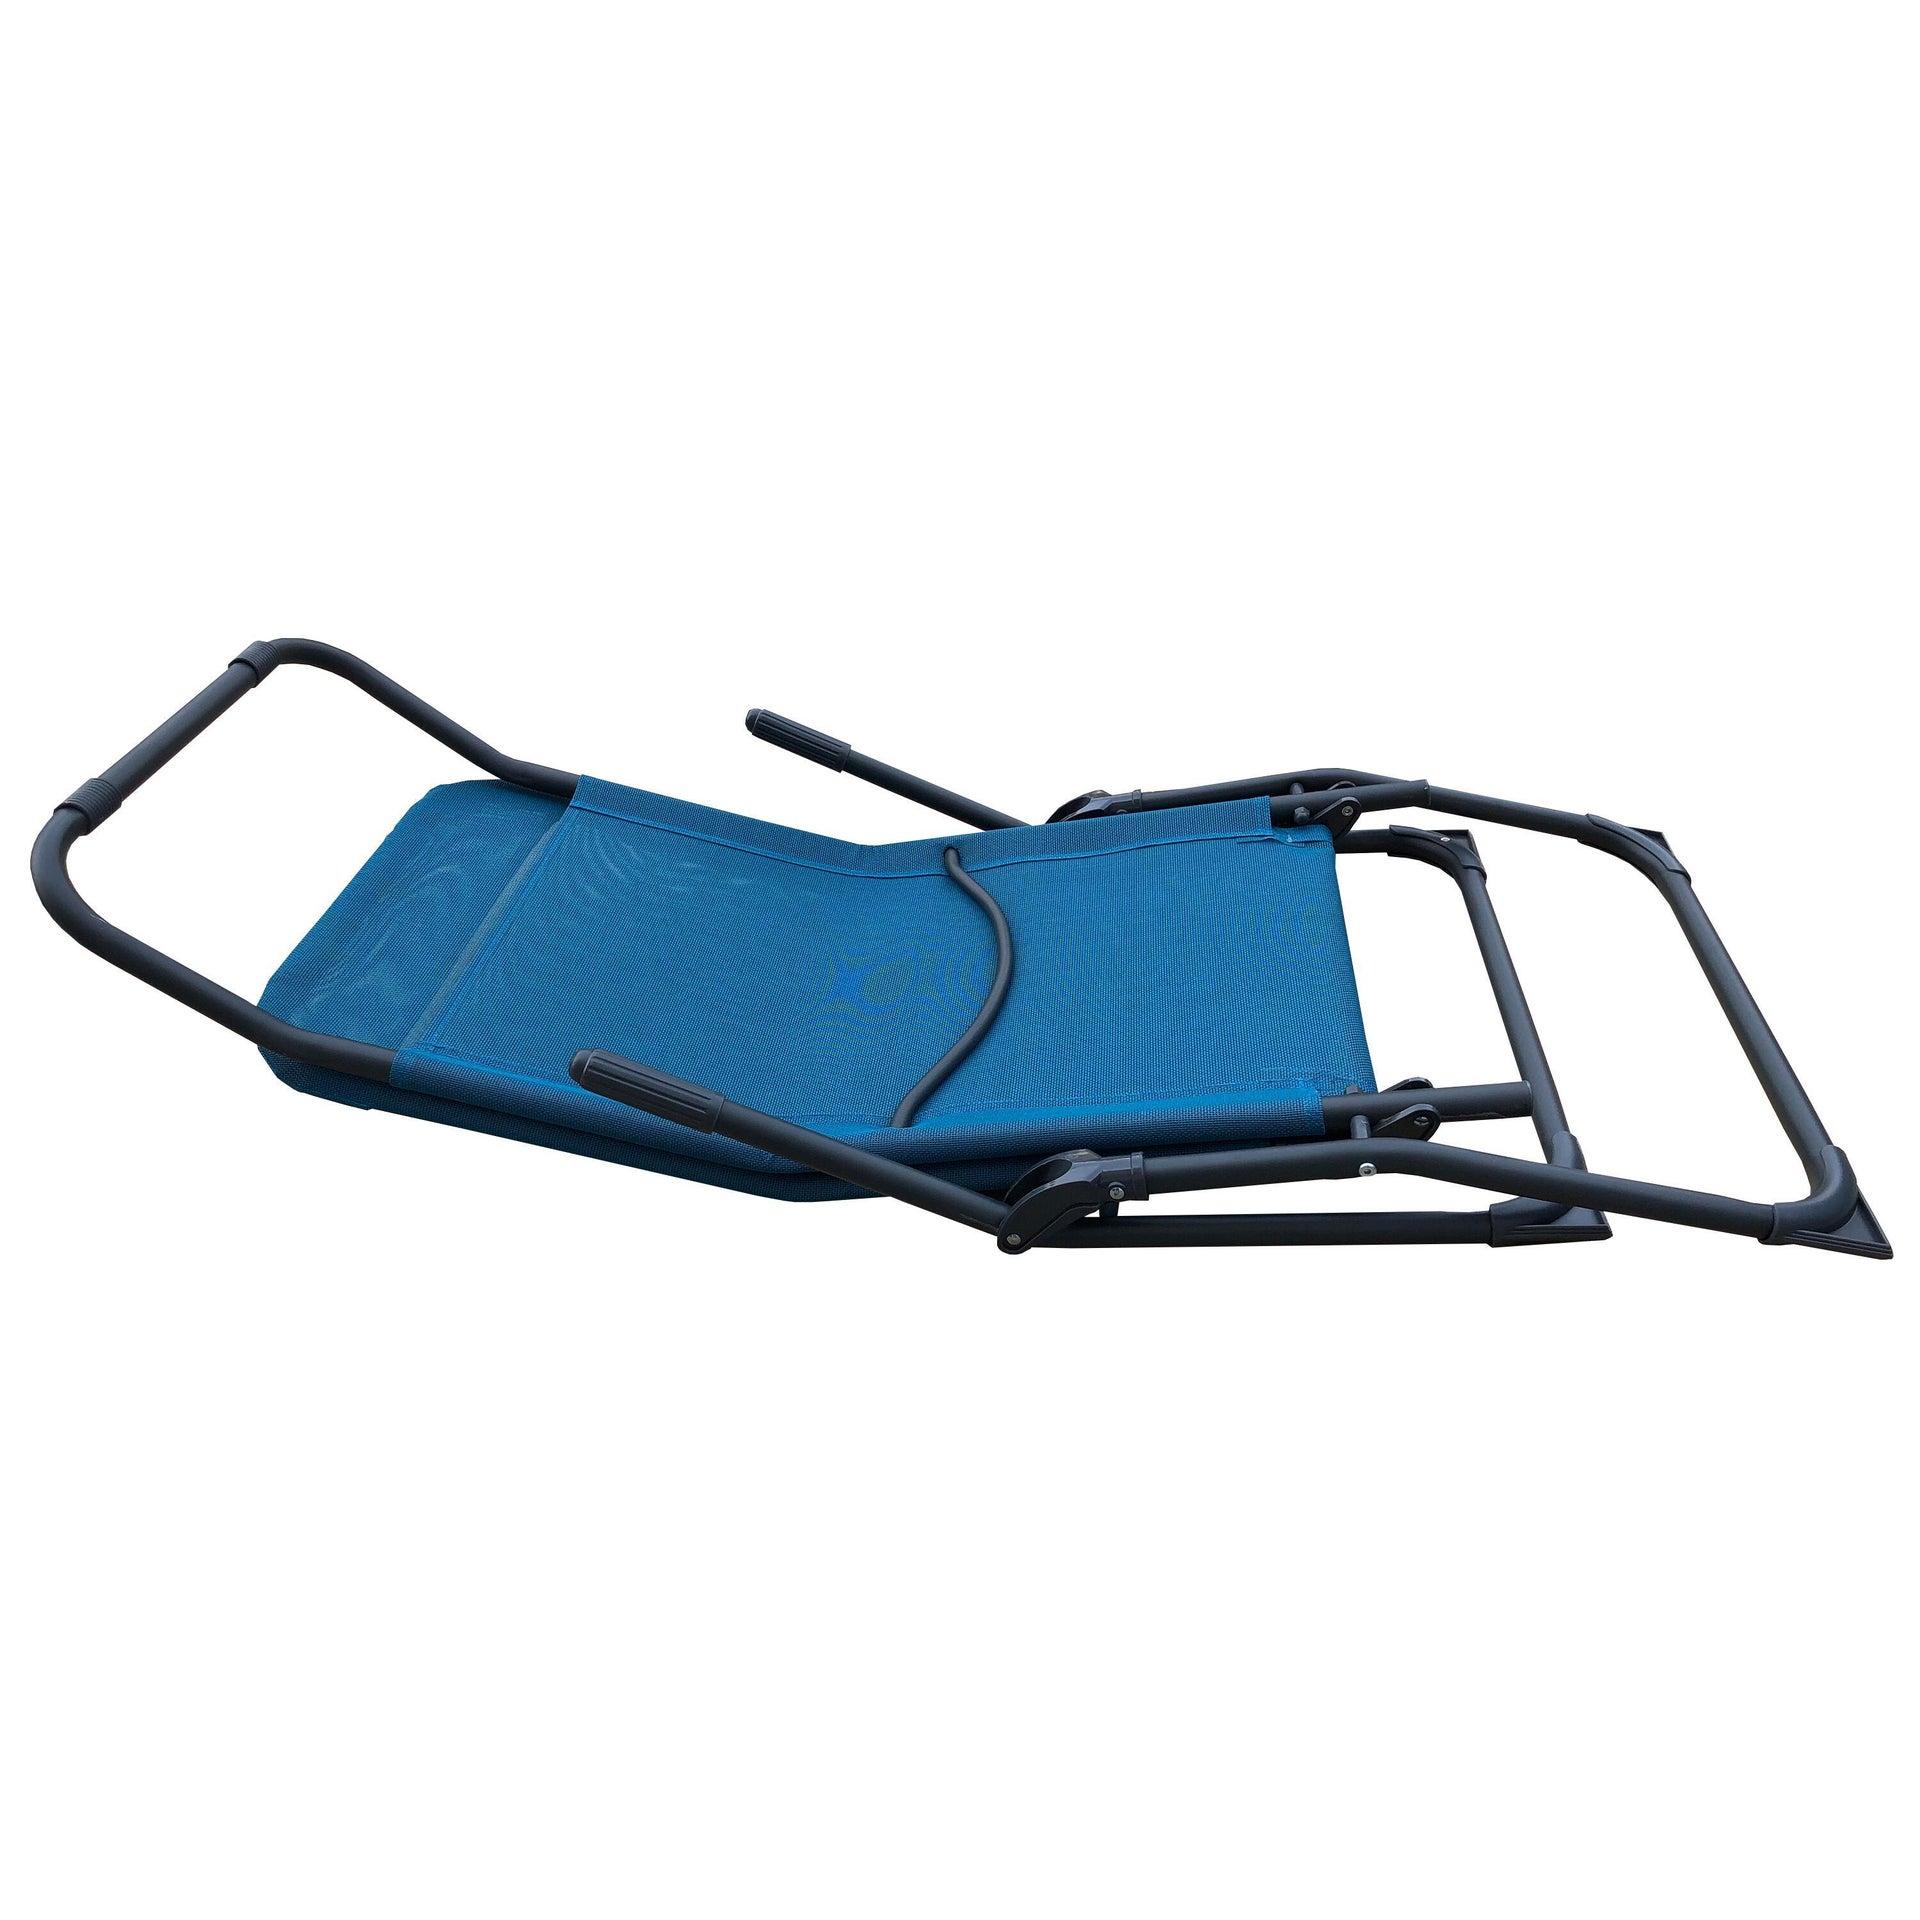 Lettino senza cuscino Fiesta in acciaio blu - 5